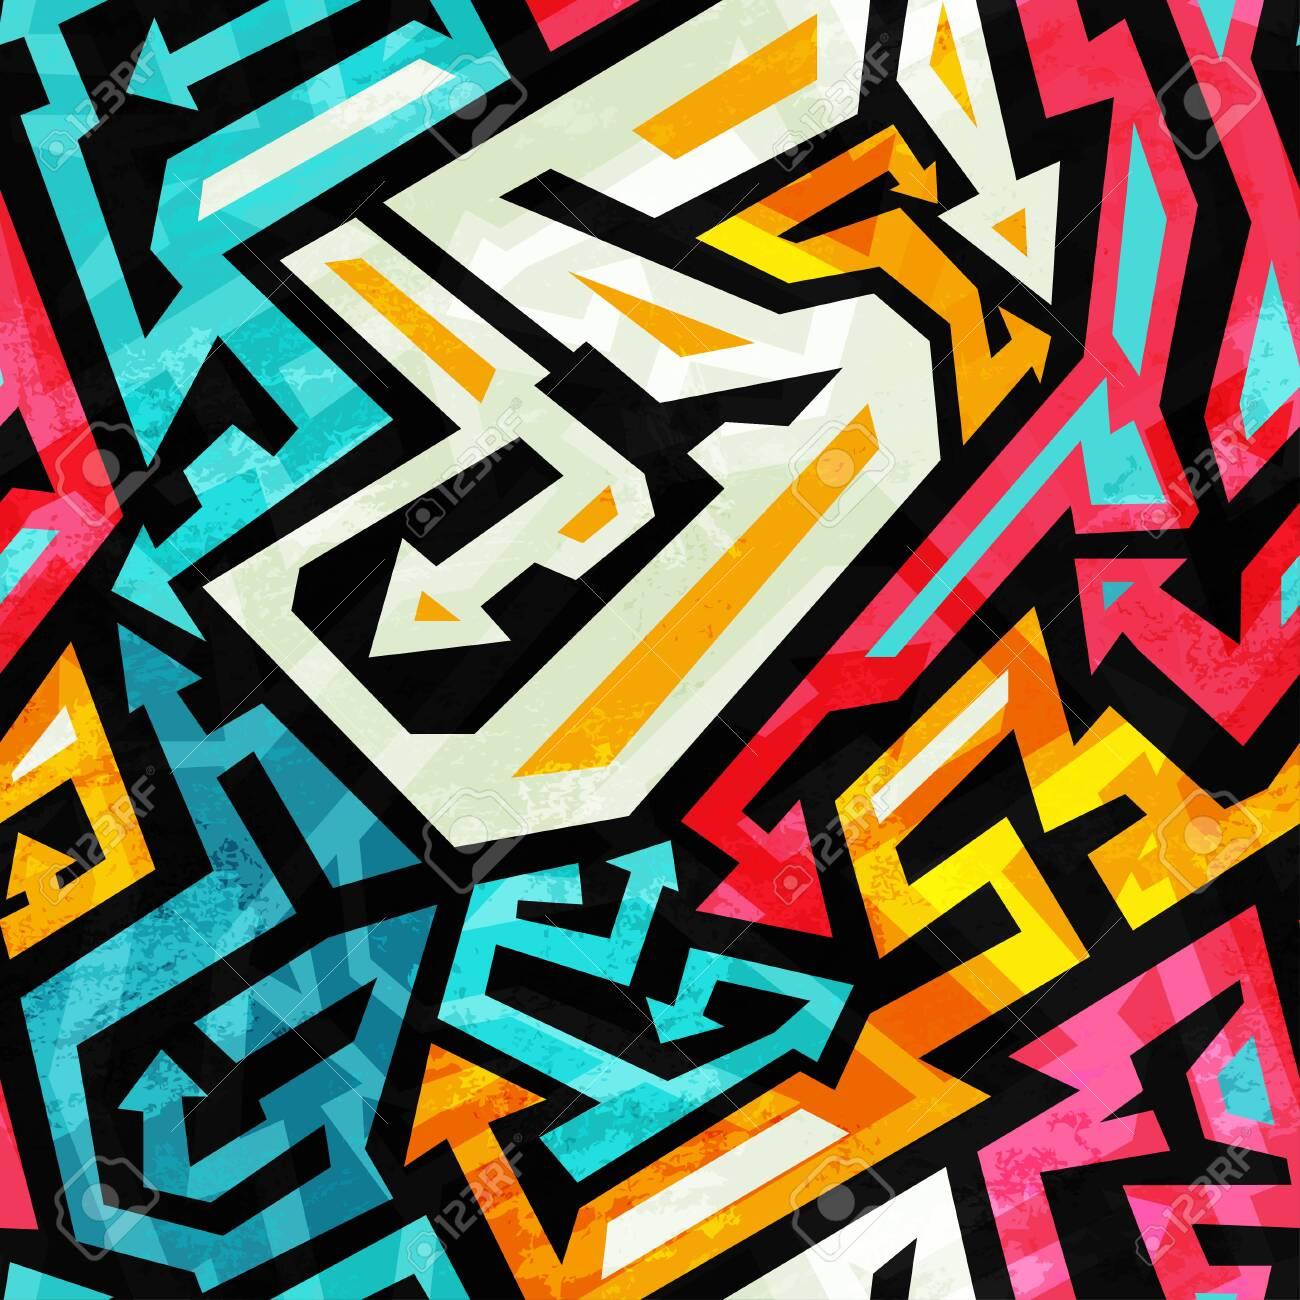 Abstract geometric seamless pattern - 144754729